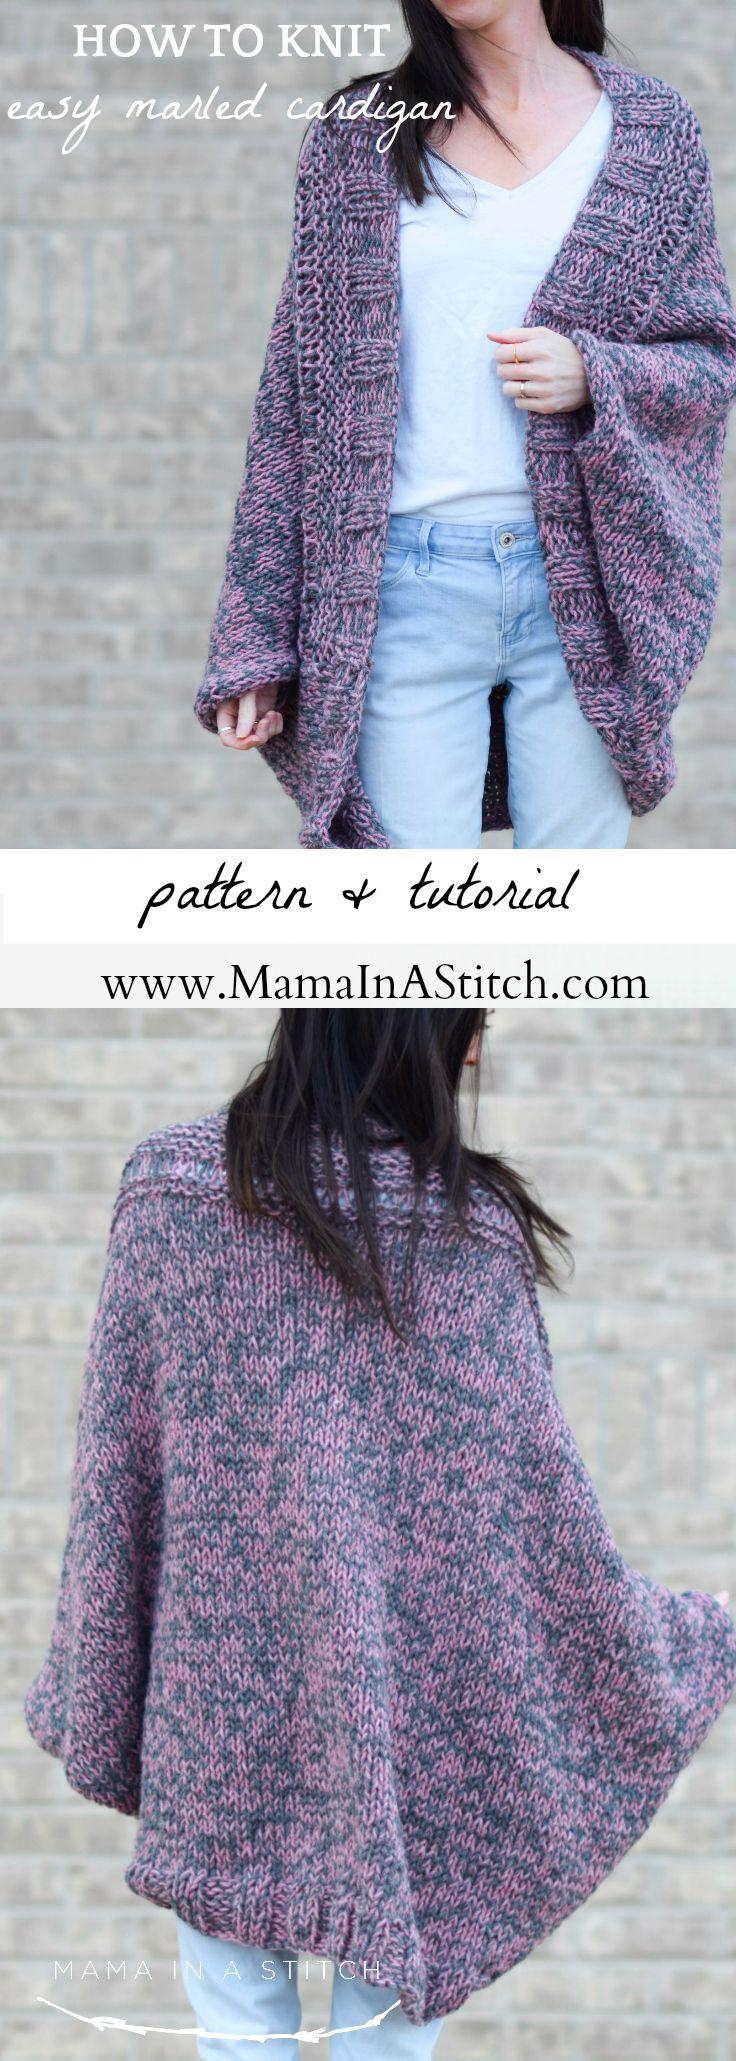 Easy Relaxed Marled Cardigan Knitting Pattern via @MamaInAStitch